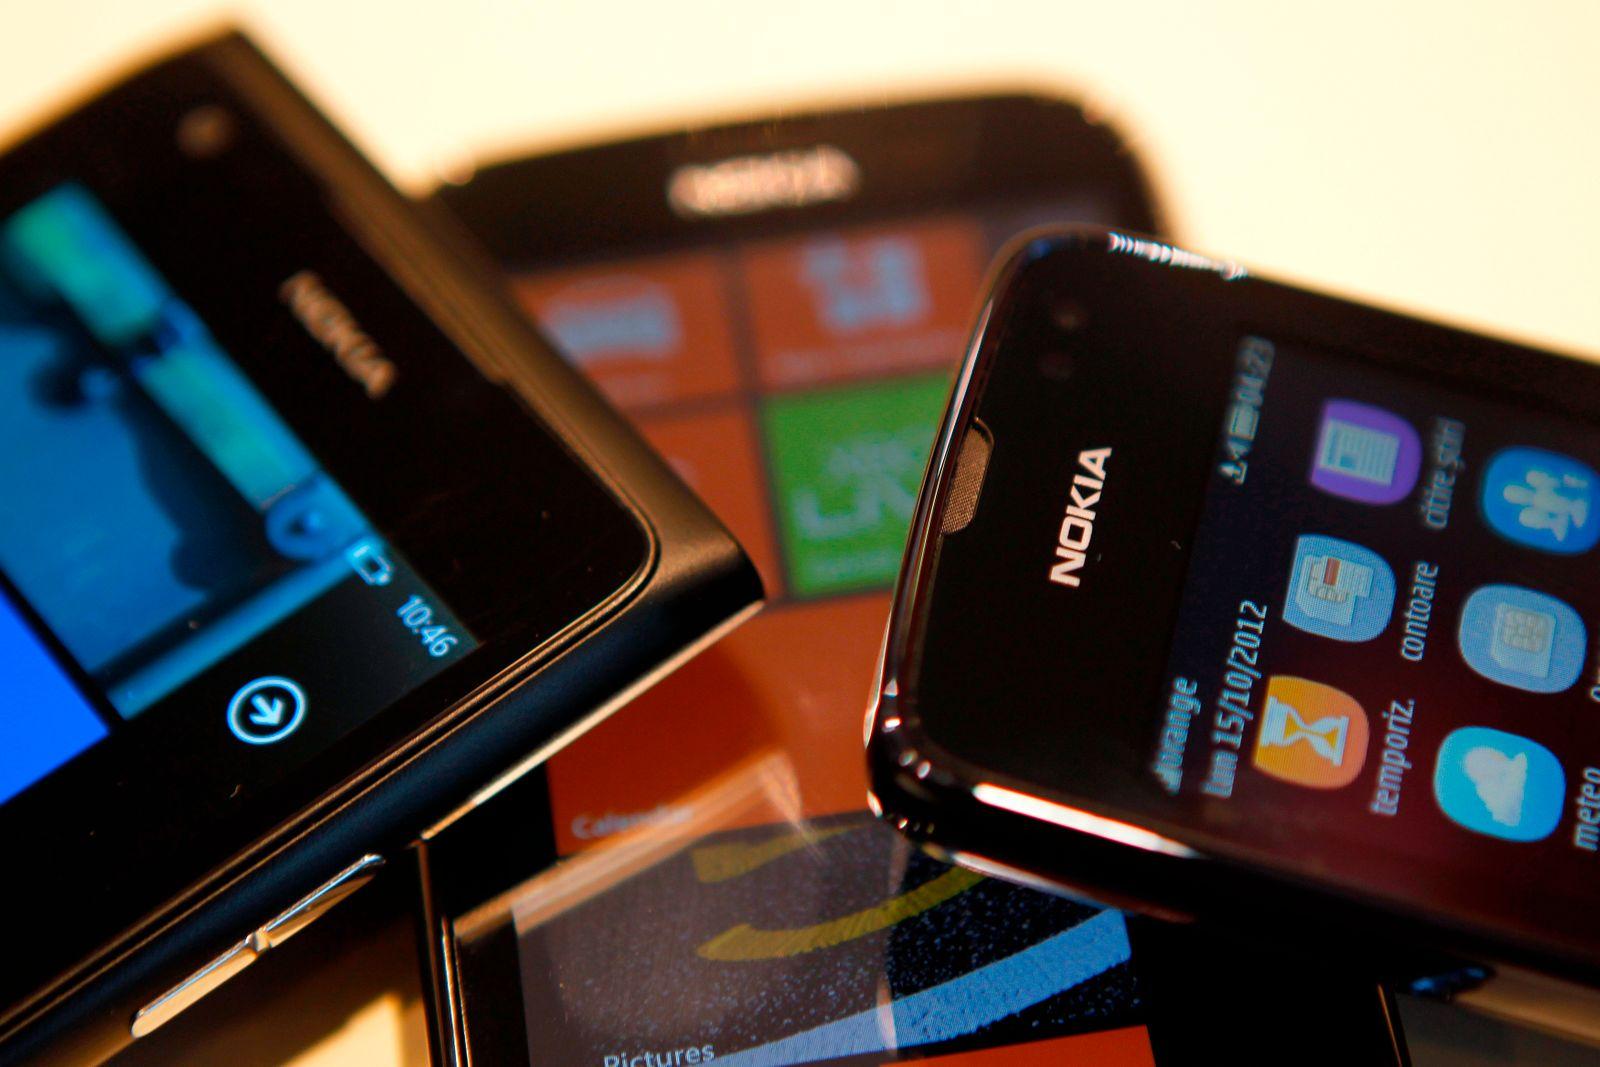 NOKIA Handy / Smart-Phone